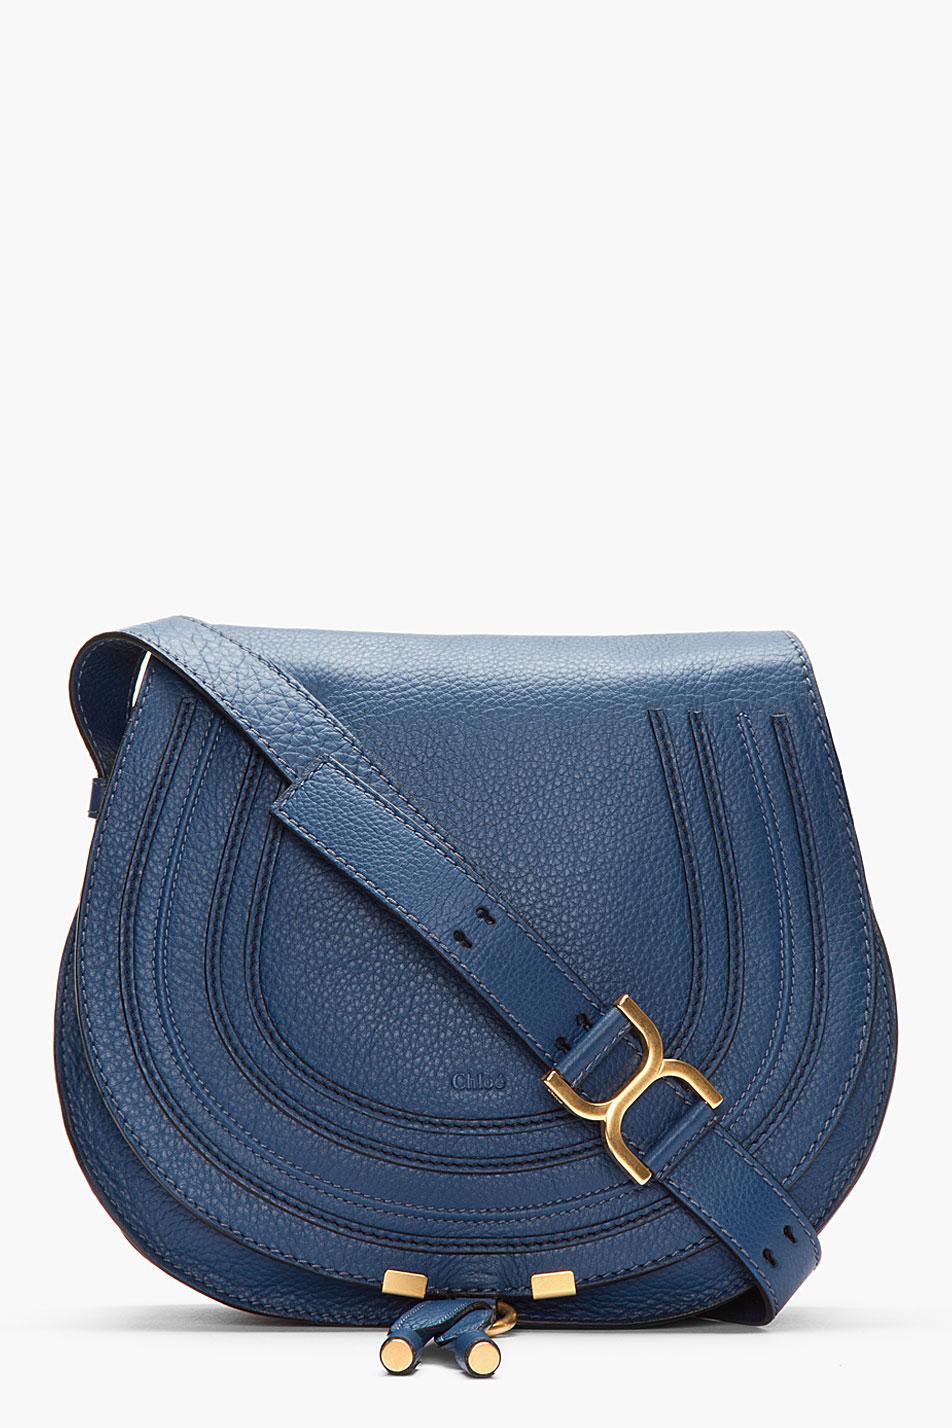 4c5c3ad84dc Chloé Medium Royal Navy Leather Marcie Shoulder Bag in Blue - Lyst